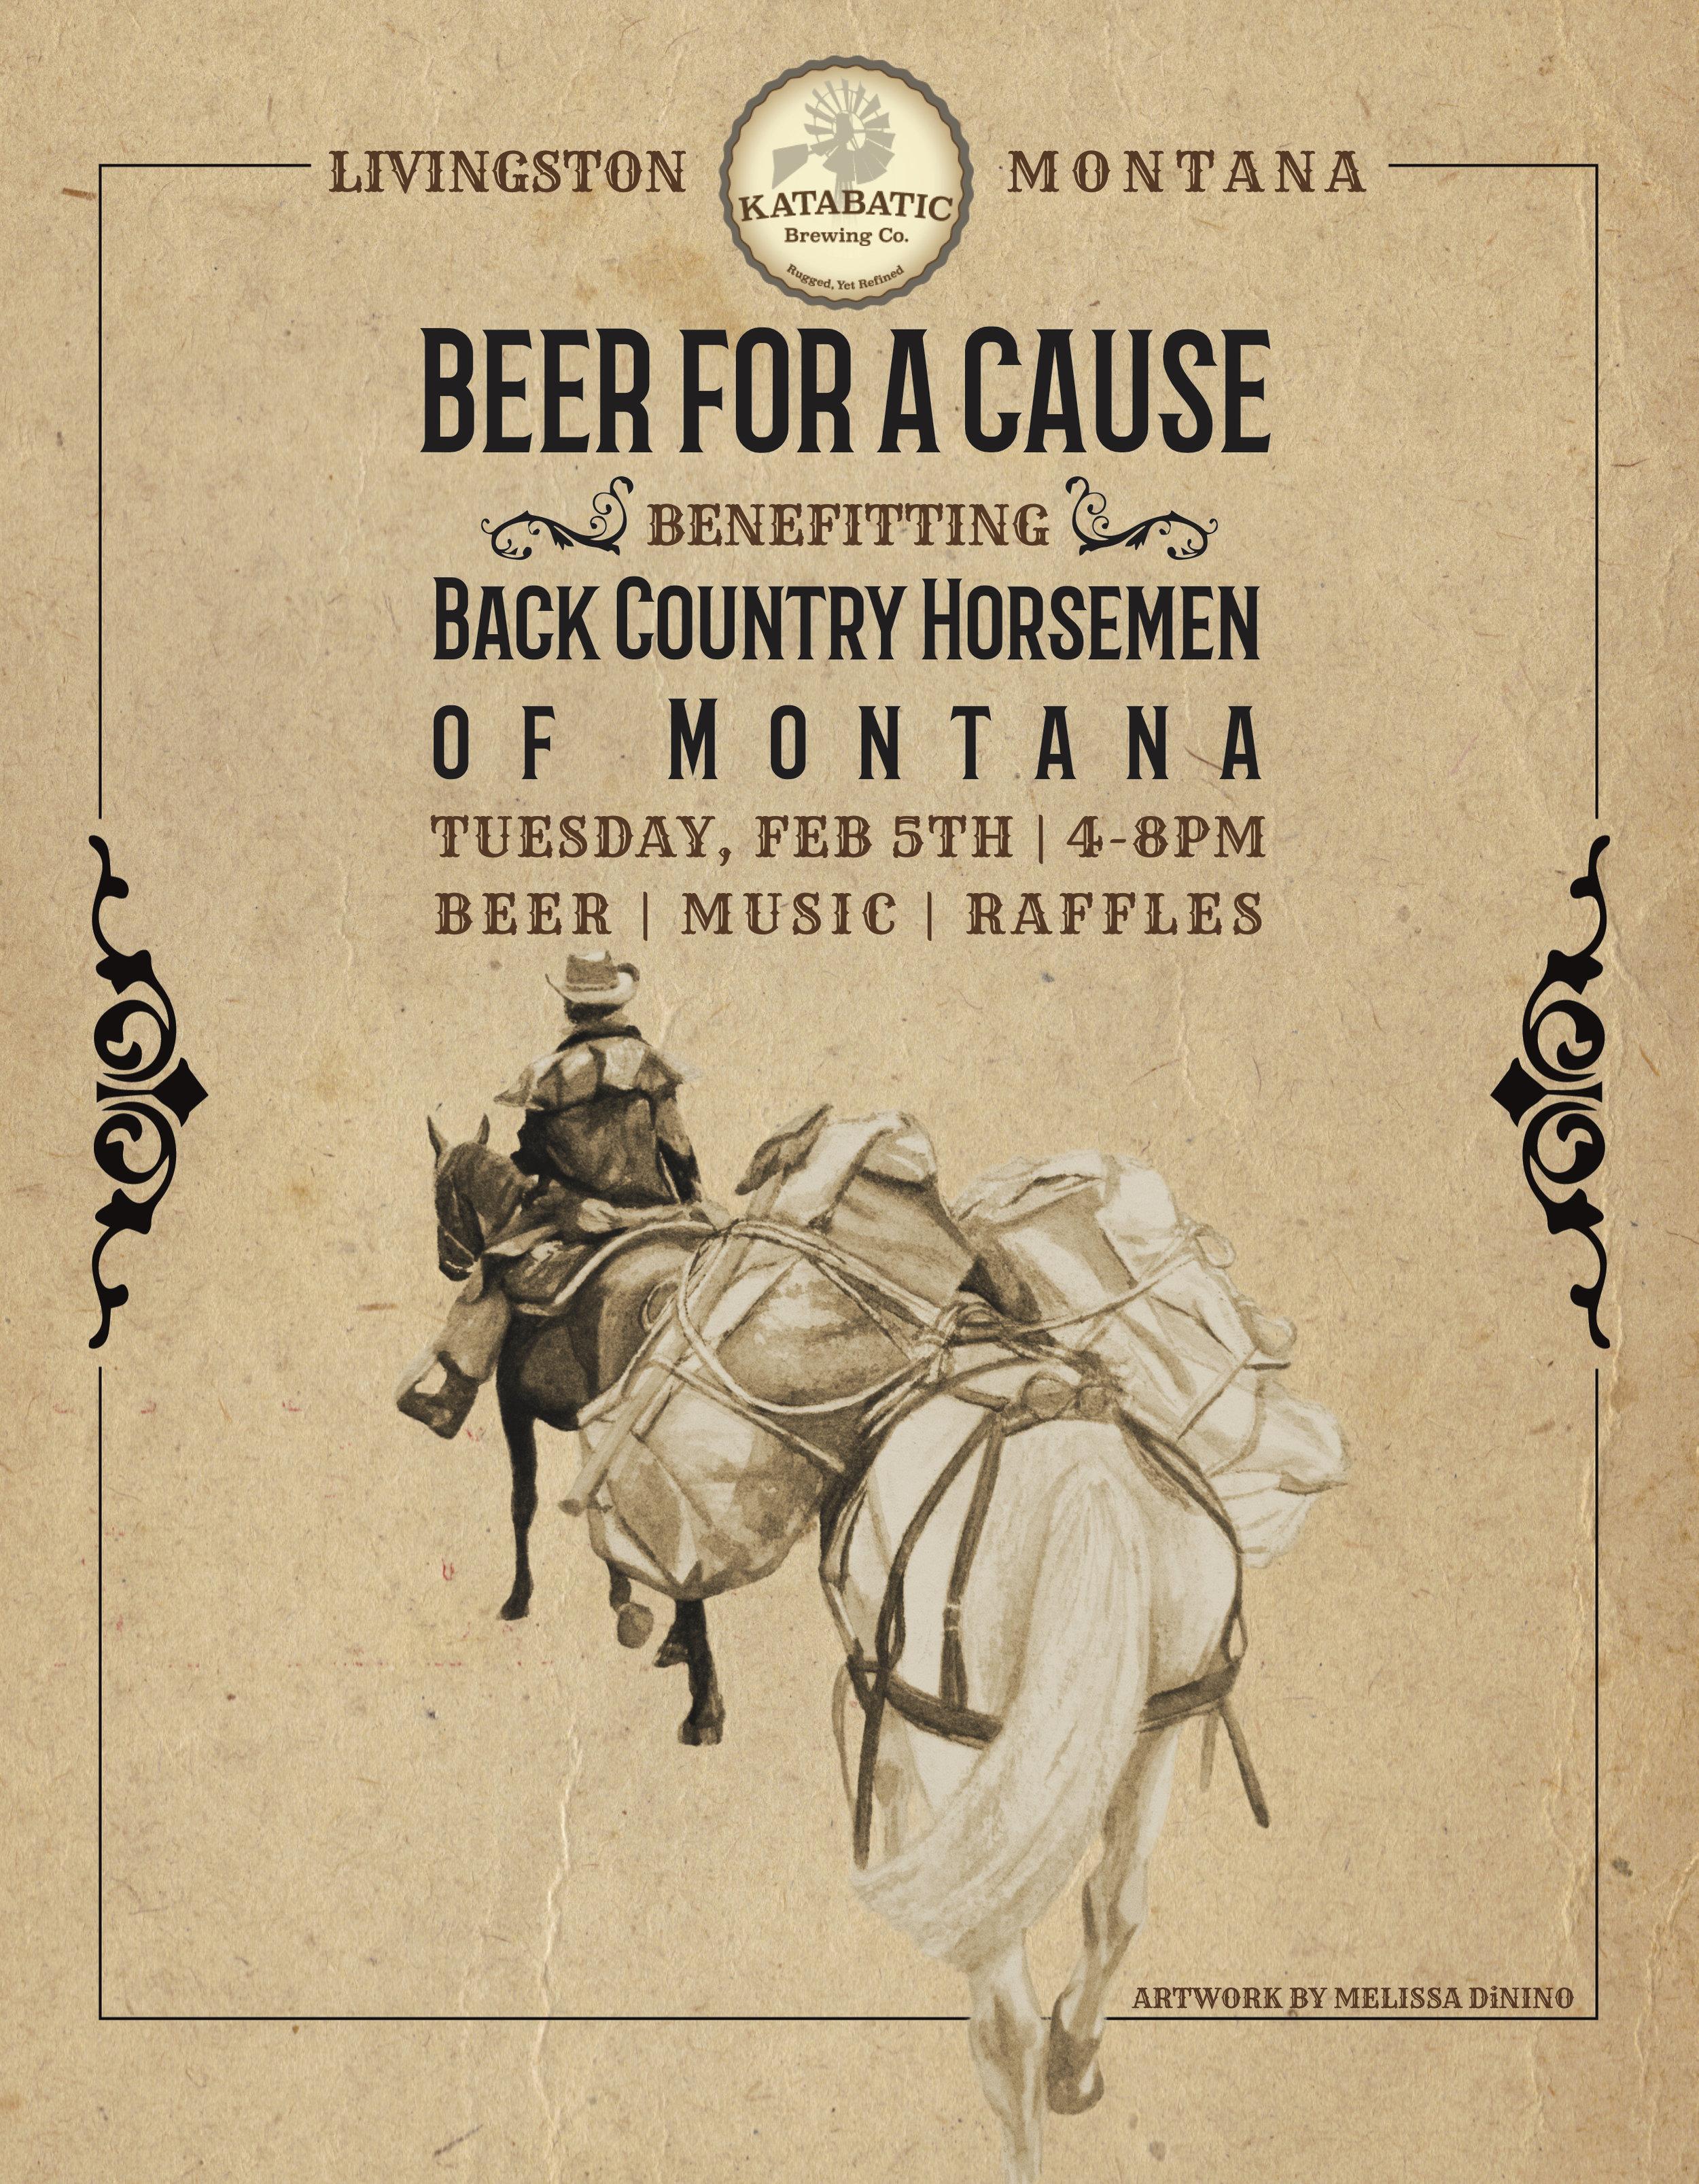 Back Country Horsemen of Montana | Print and Digital Ad